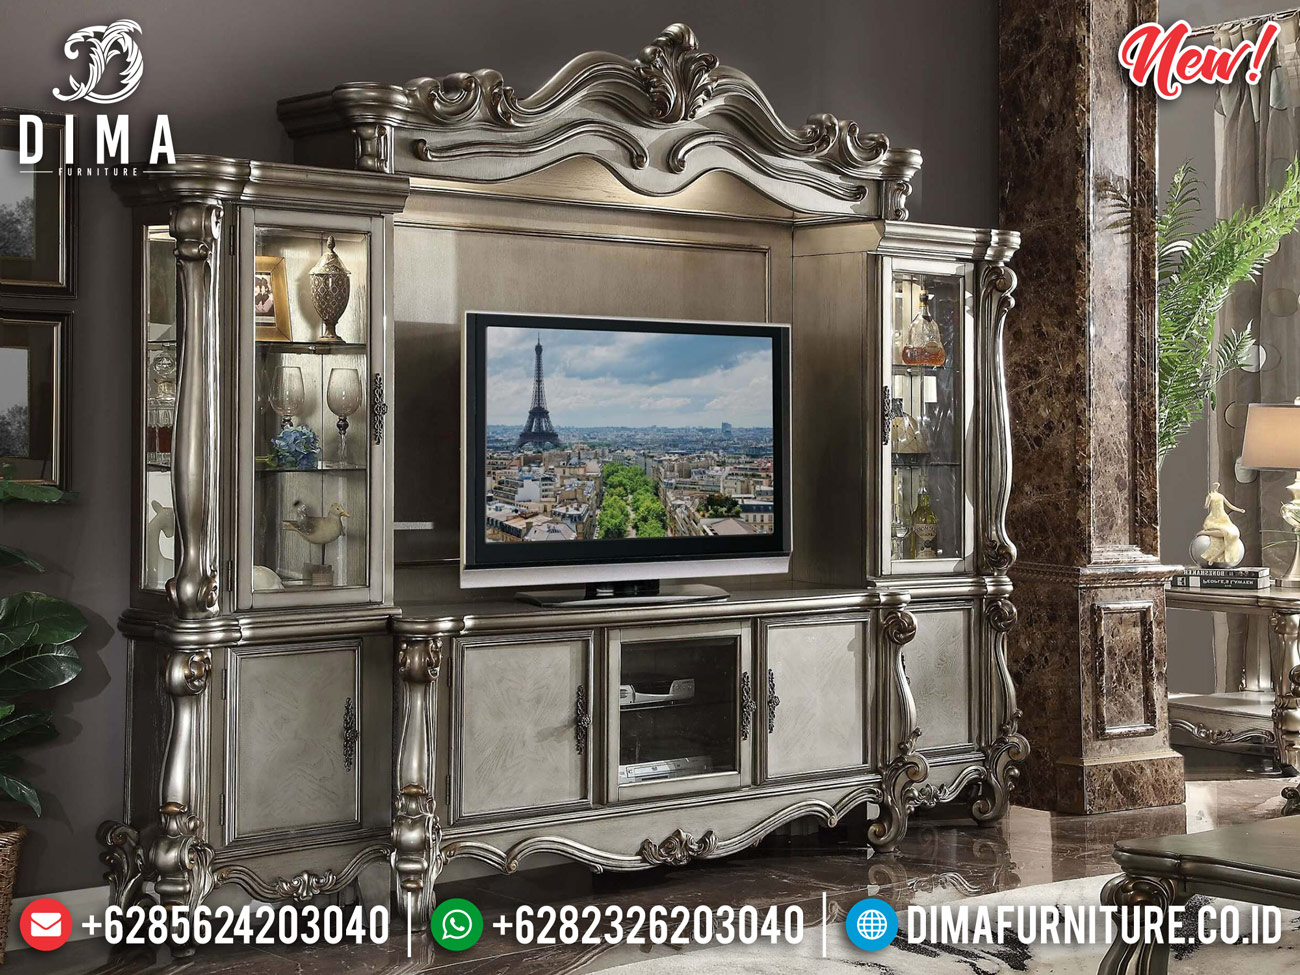 New Model Bufet TV Mewah Luxury Classic Furniture Jepara Terbaru TTJ-0847 Model 1